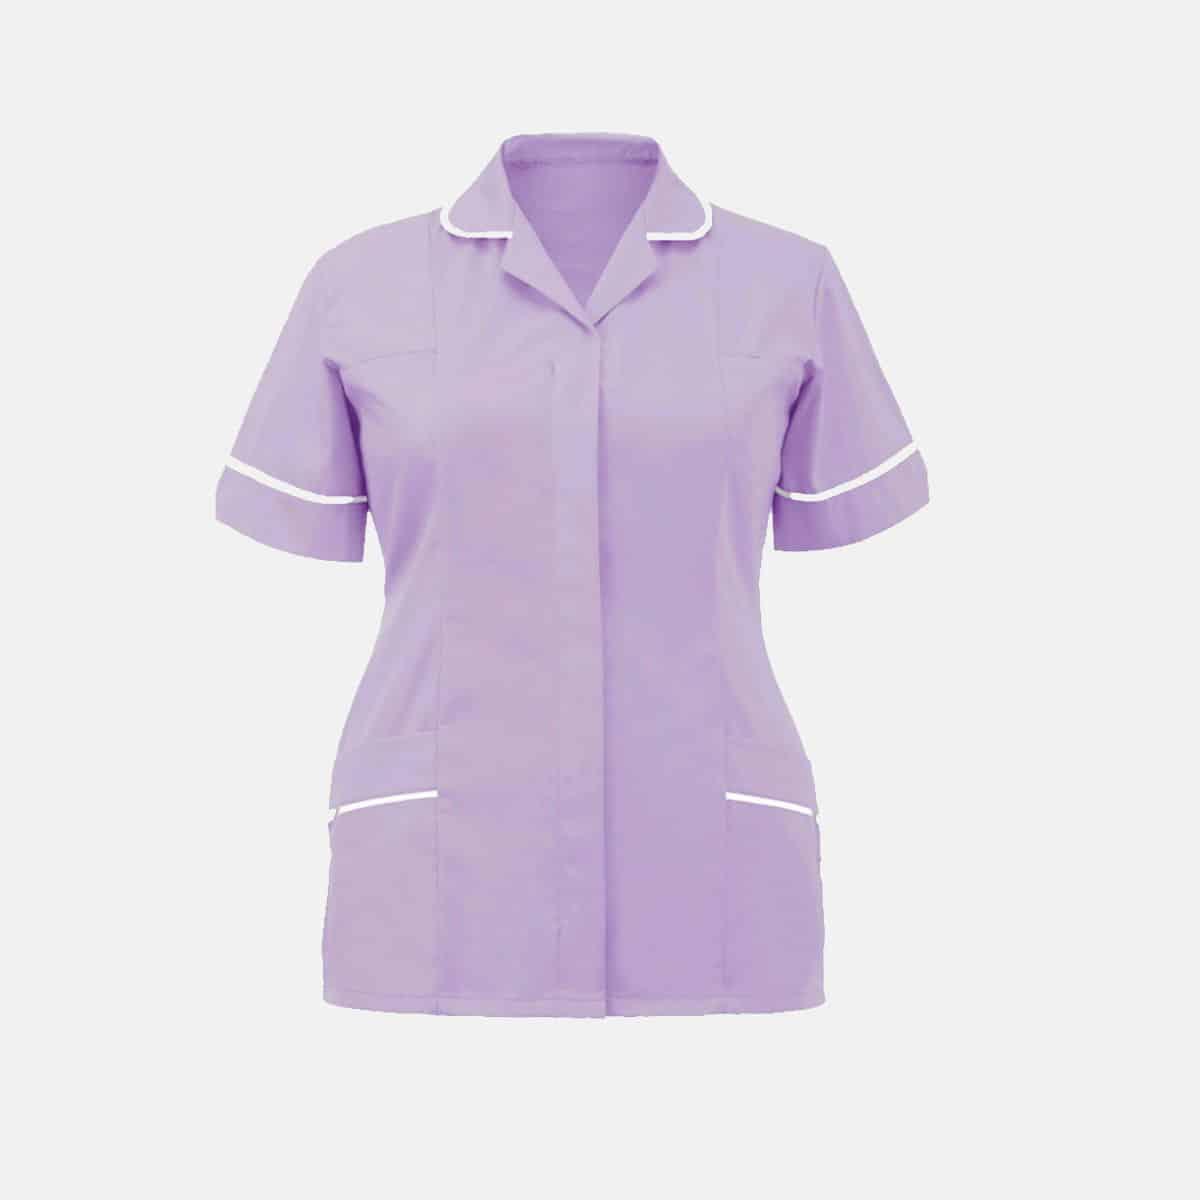 Nurses Healthcare Tunic Therapist Dentist Uniform